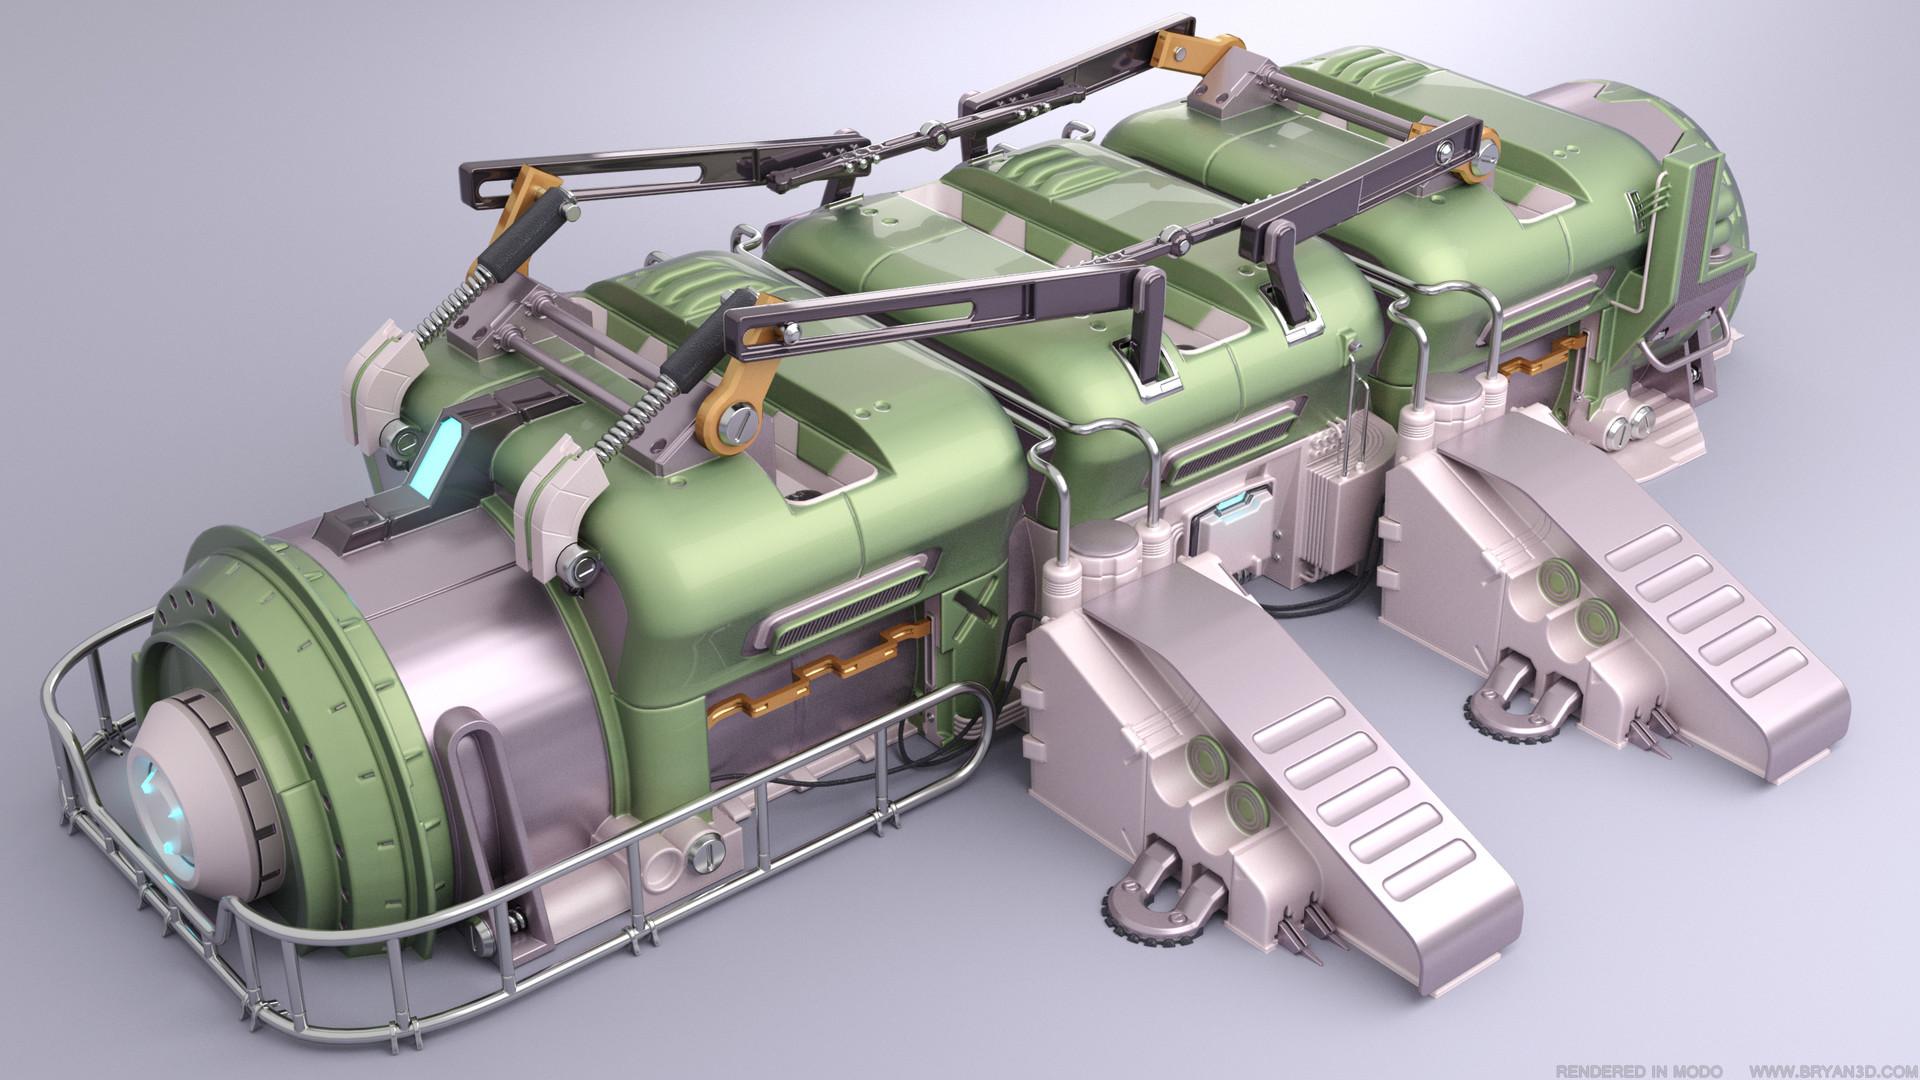 Bryan shannon 0 generator final 01